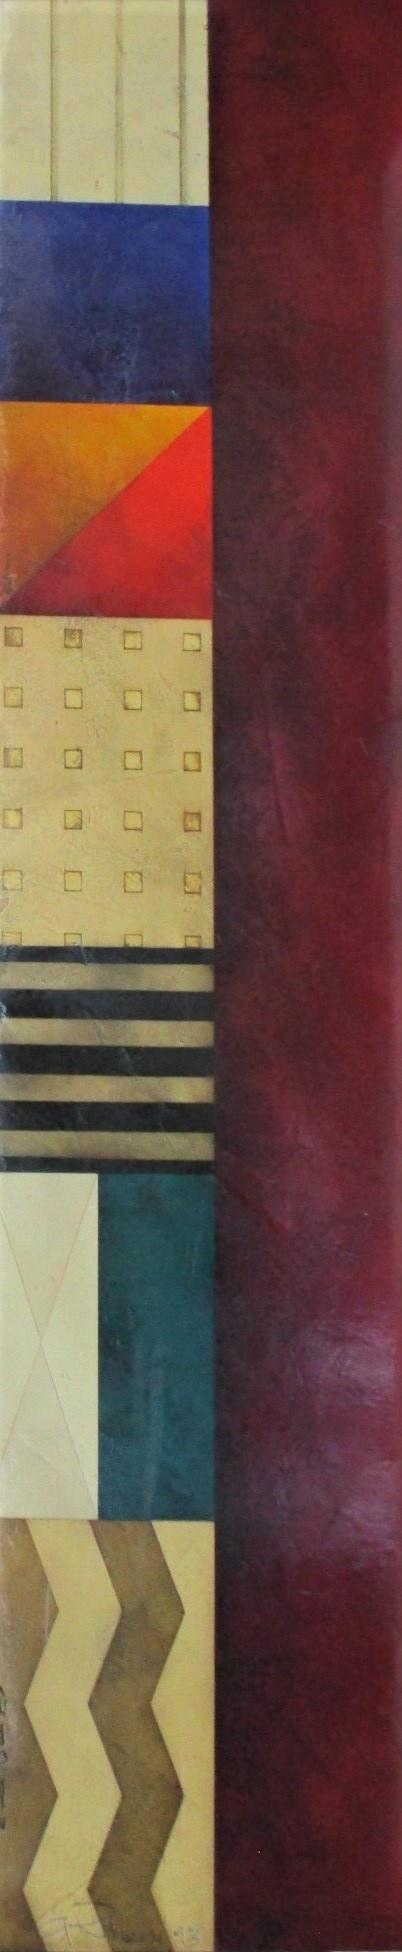 Split Shift by  Gregg Robison - Masterpiece Online